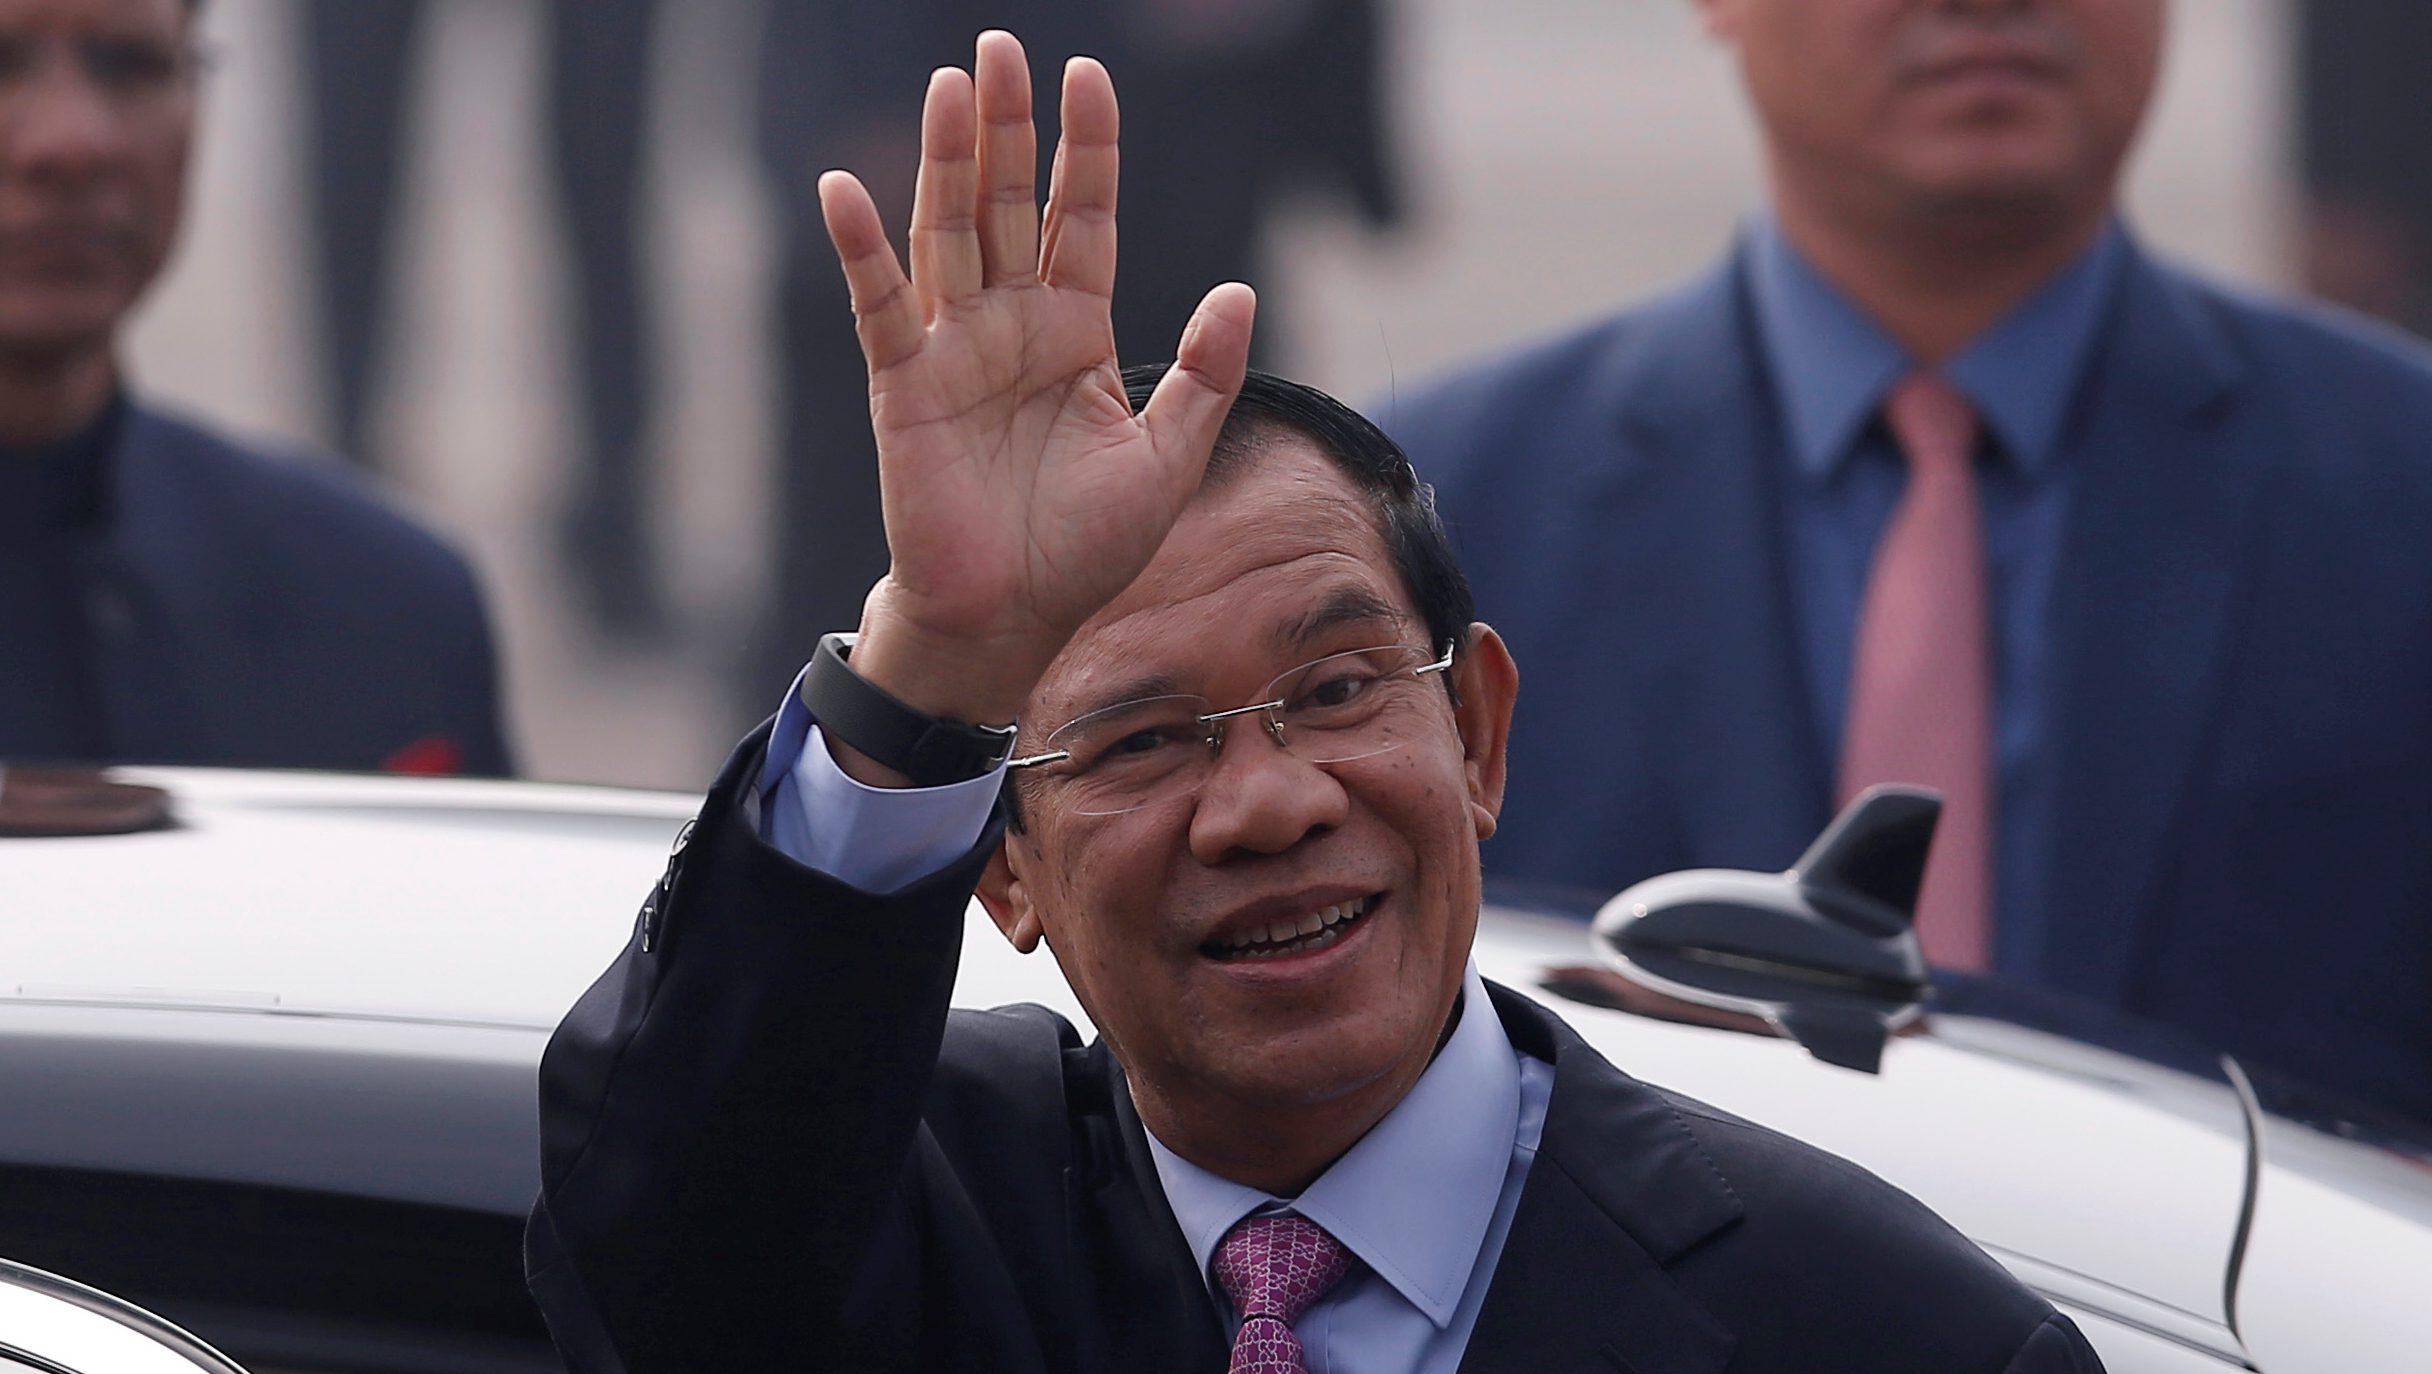 Cambodia's Prime Minister Hun Sen waves upon his arrival at Air Force Station Palam in New Delhi, India, January 24, 2018. REUTERS/Adnan Abidi - RC13046FBA70